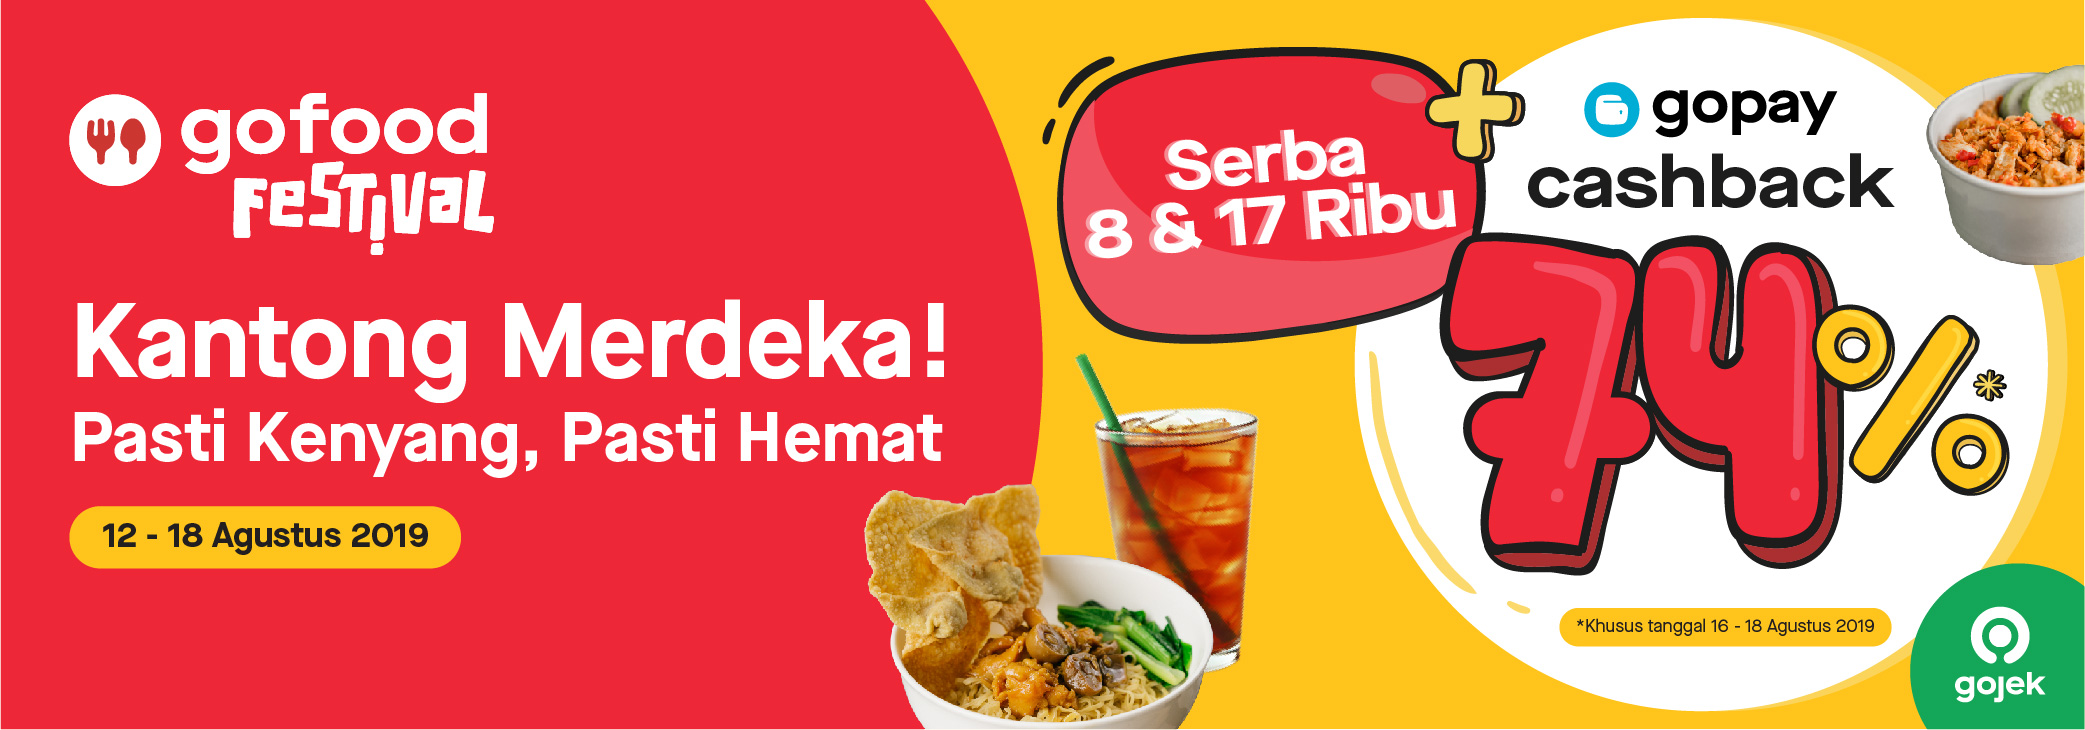 Promo GoFood Festival Agustus 2019: Menu Serba 8 & 17 Ribu di GoFood Festival